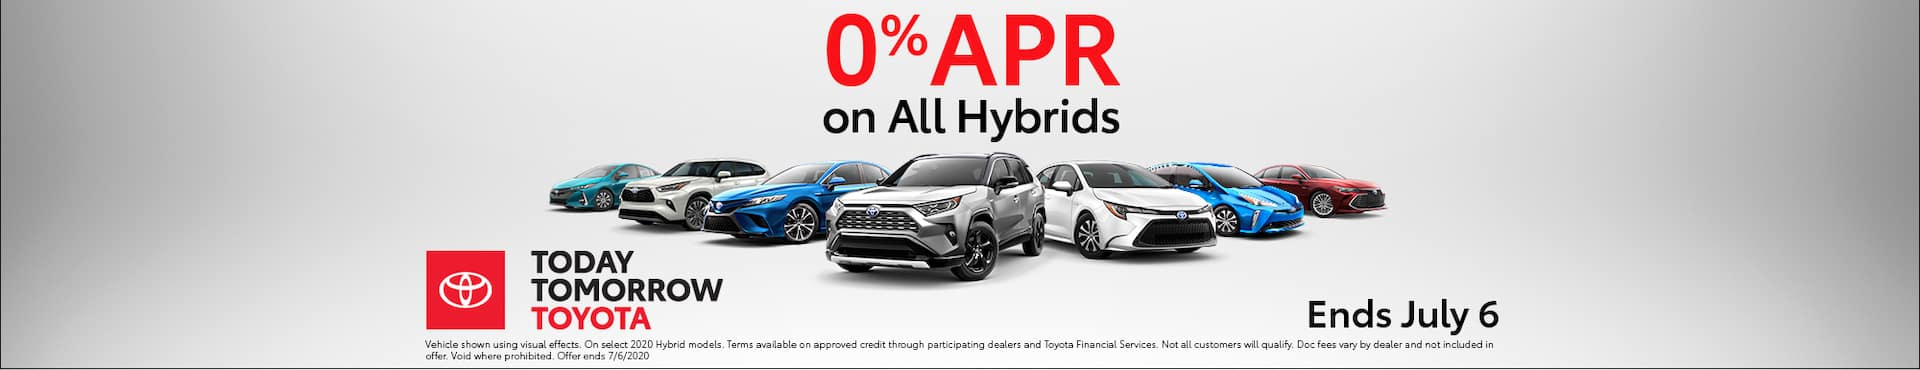 Hybrid 0% APR